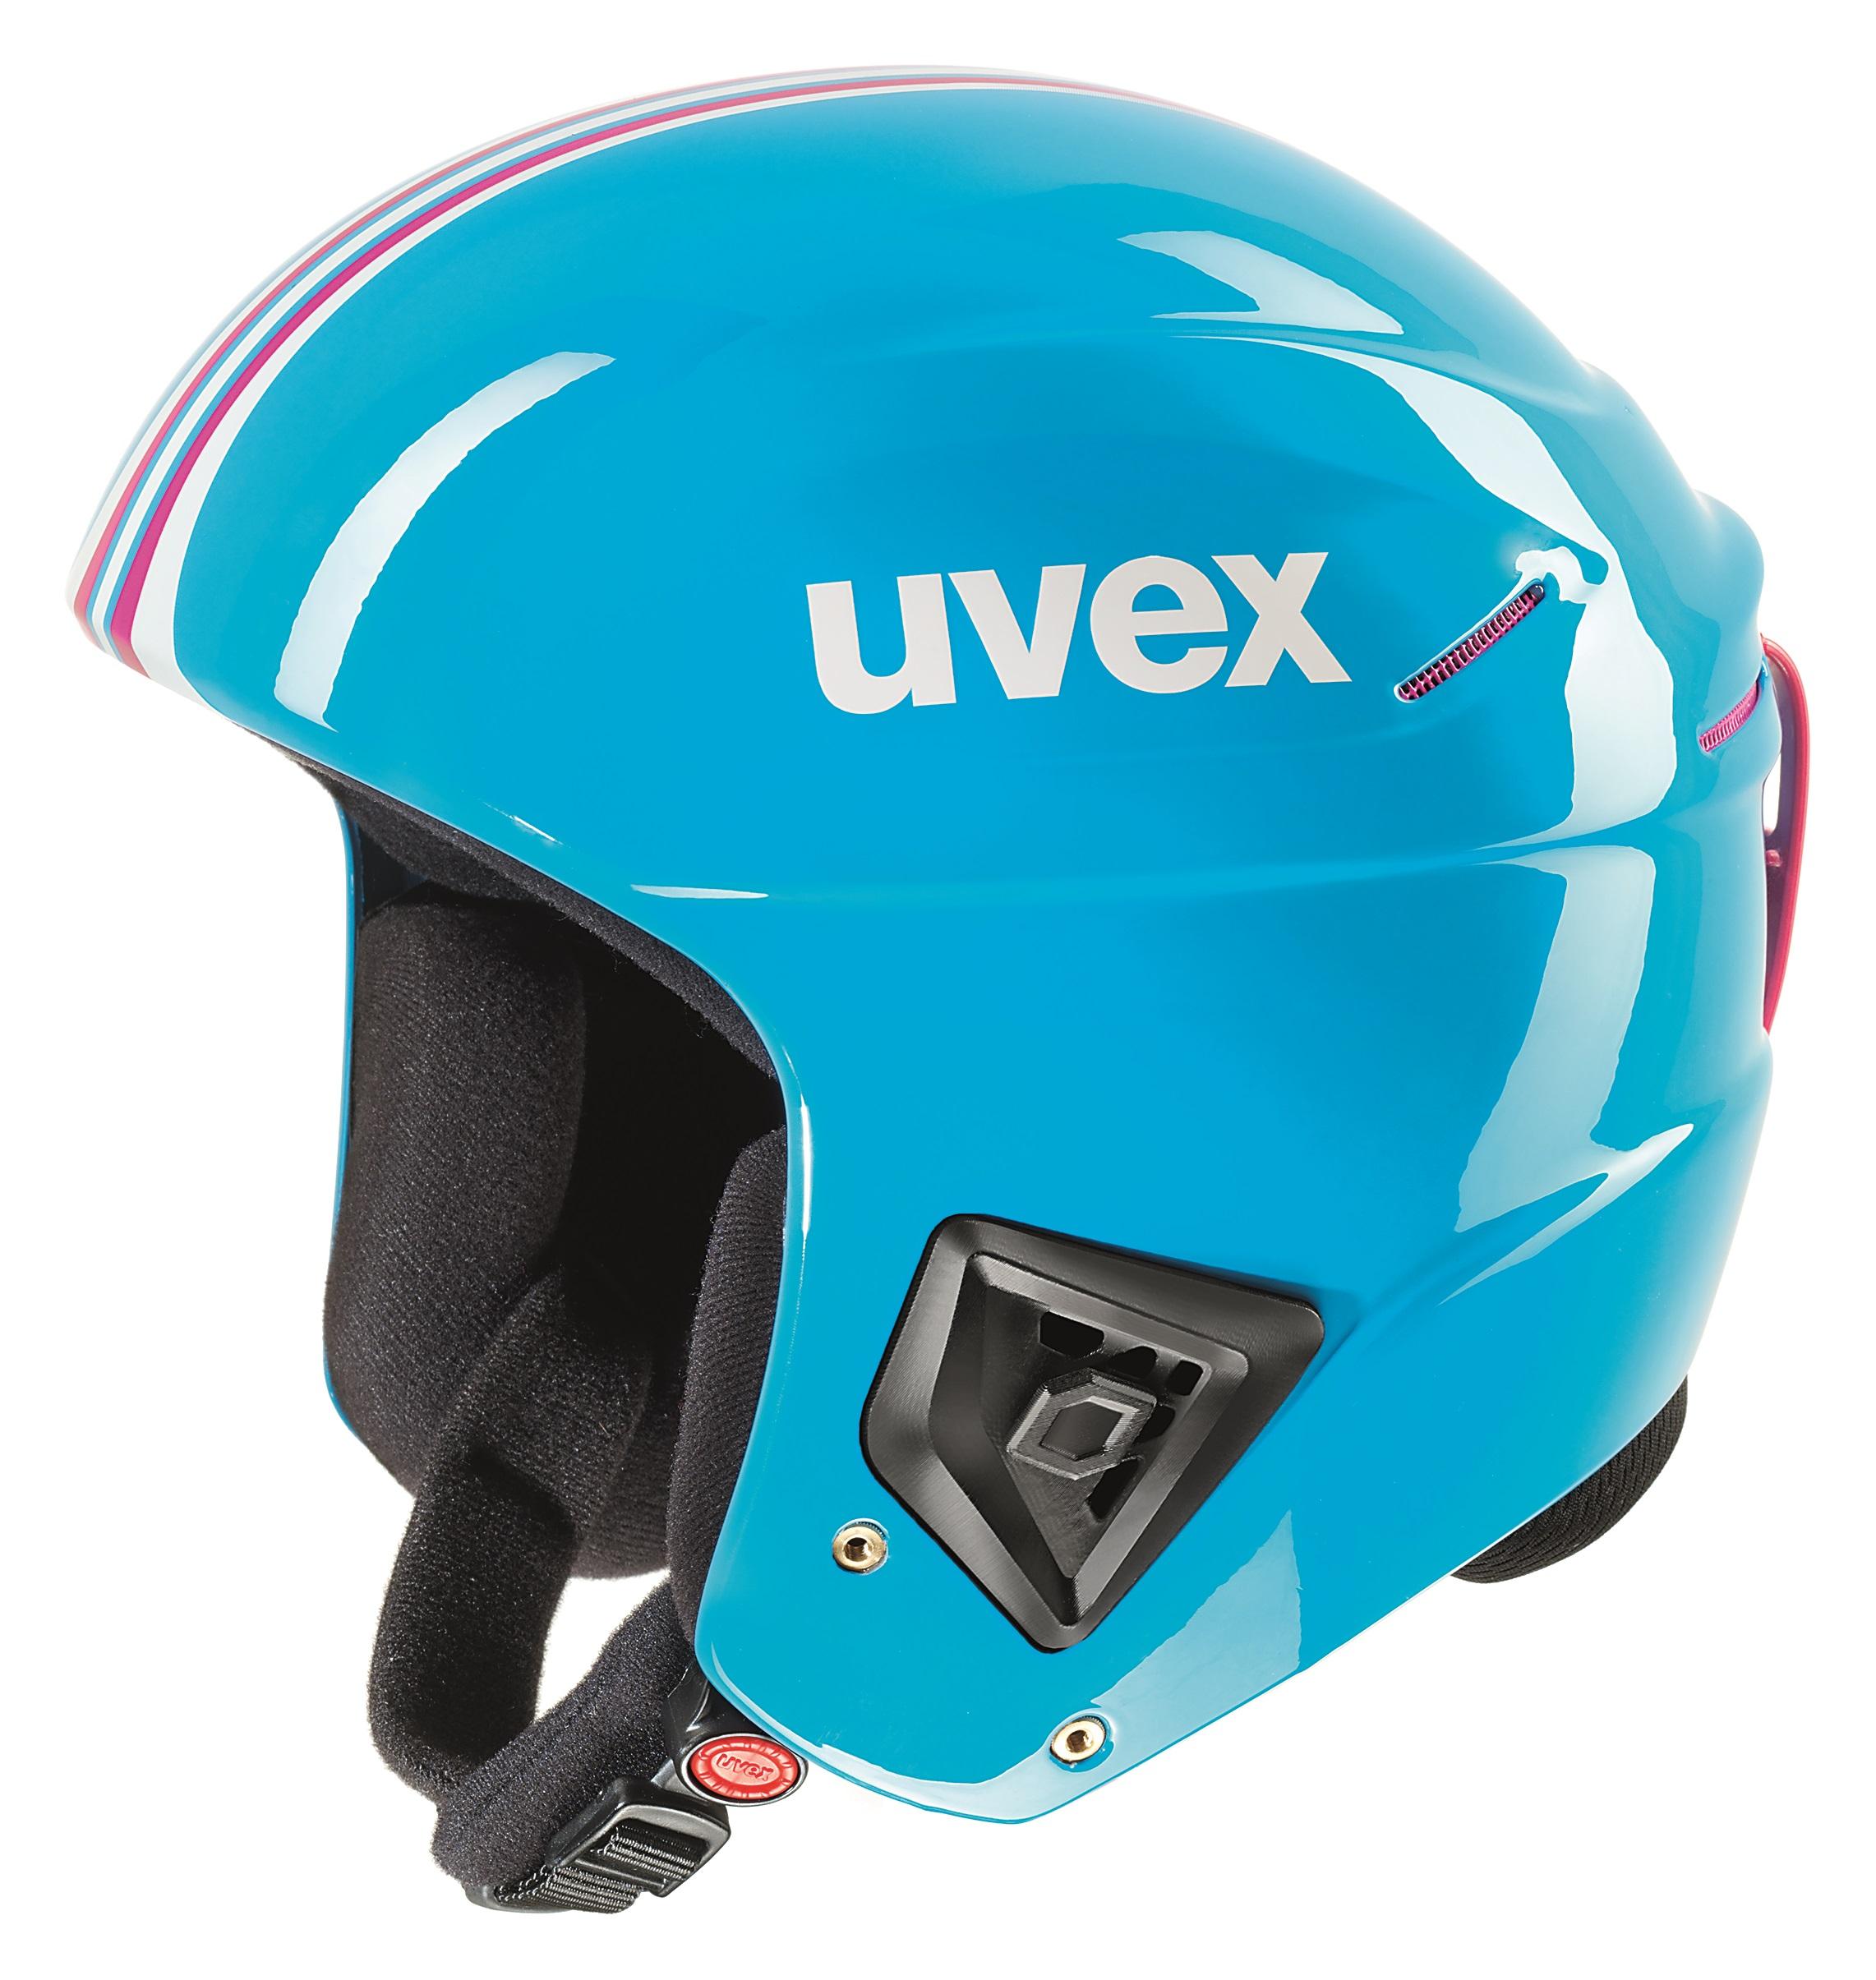 uvex Sports _ SKI- / WIntersports-Kataloge  2011/12 - 2014/15 _ Helmets